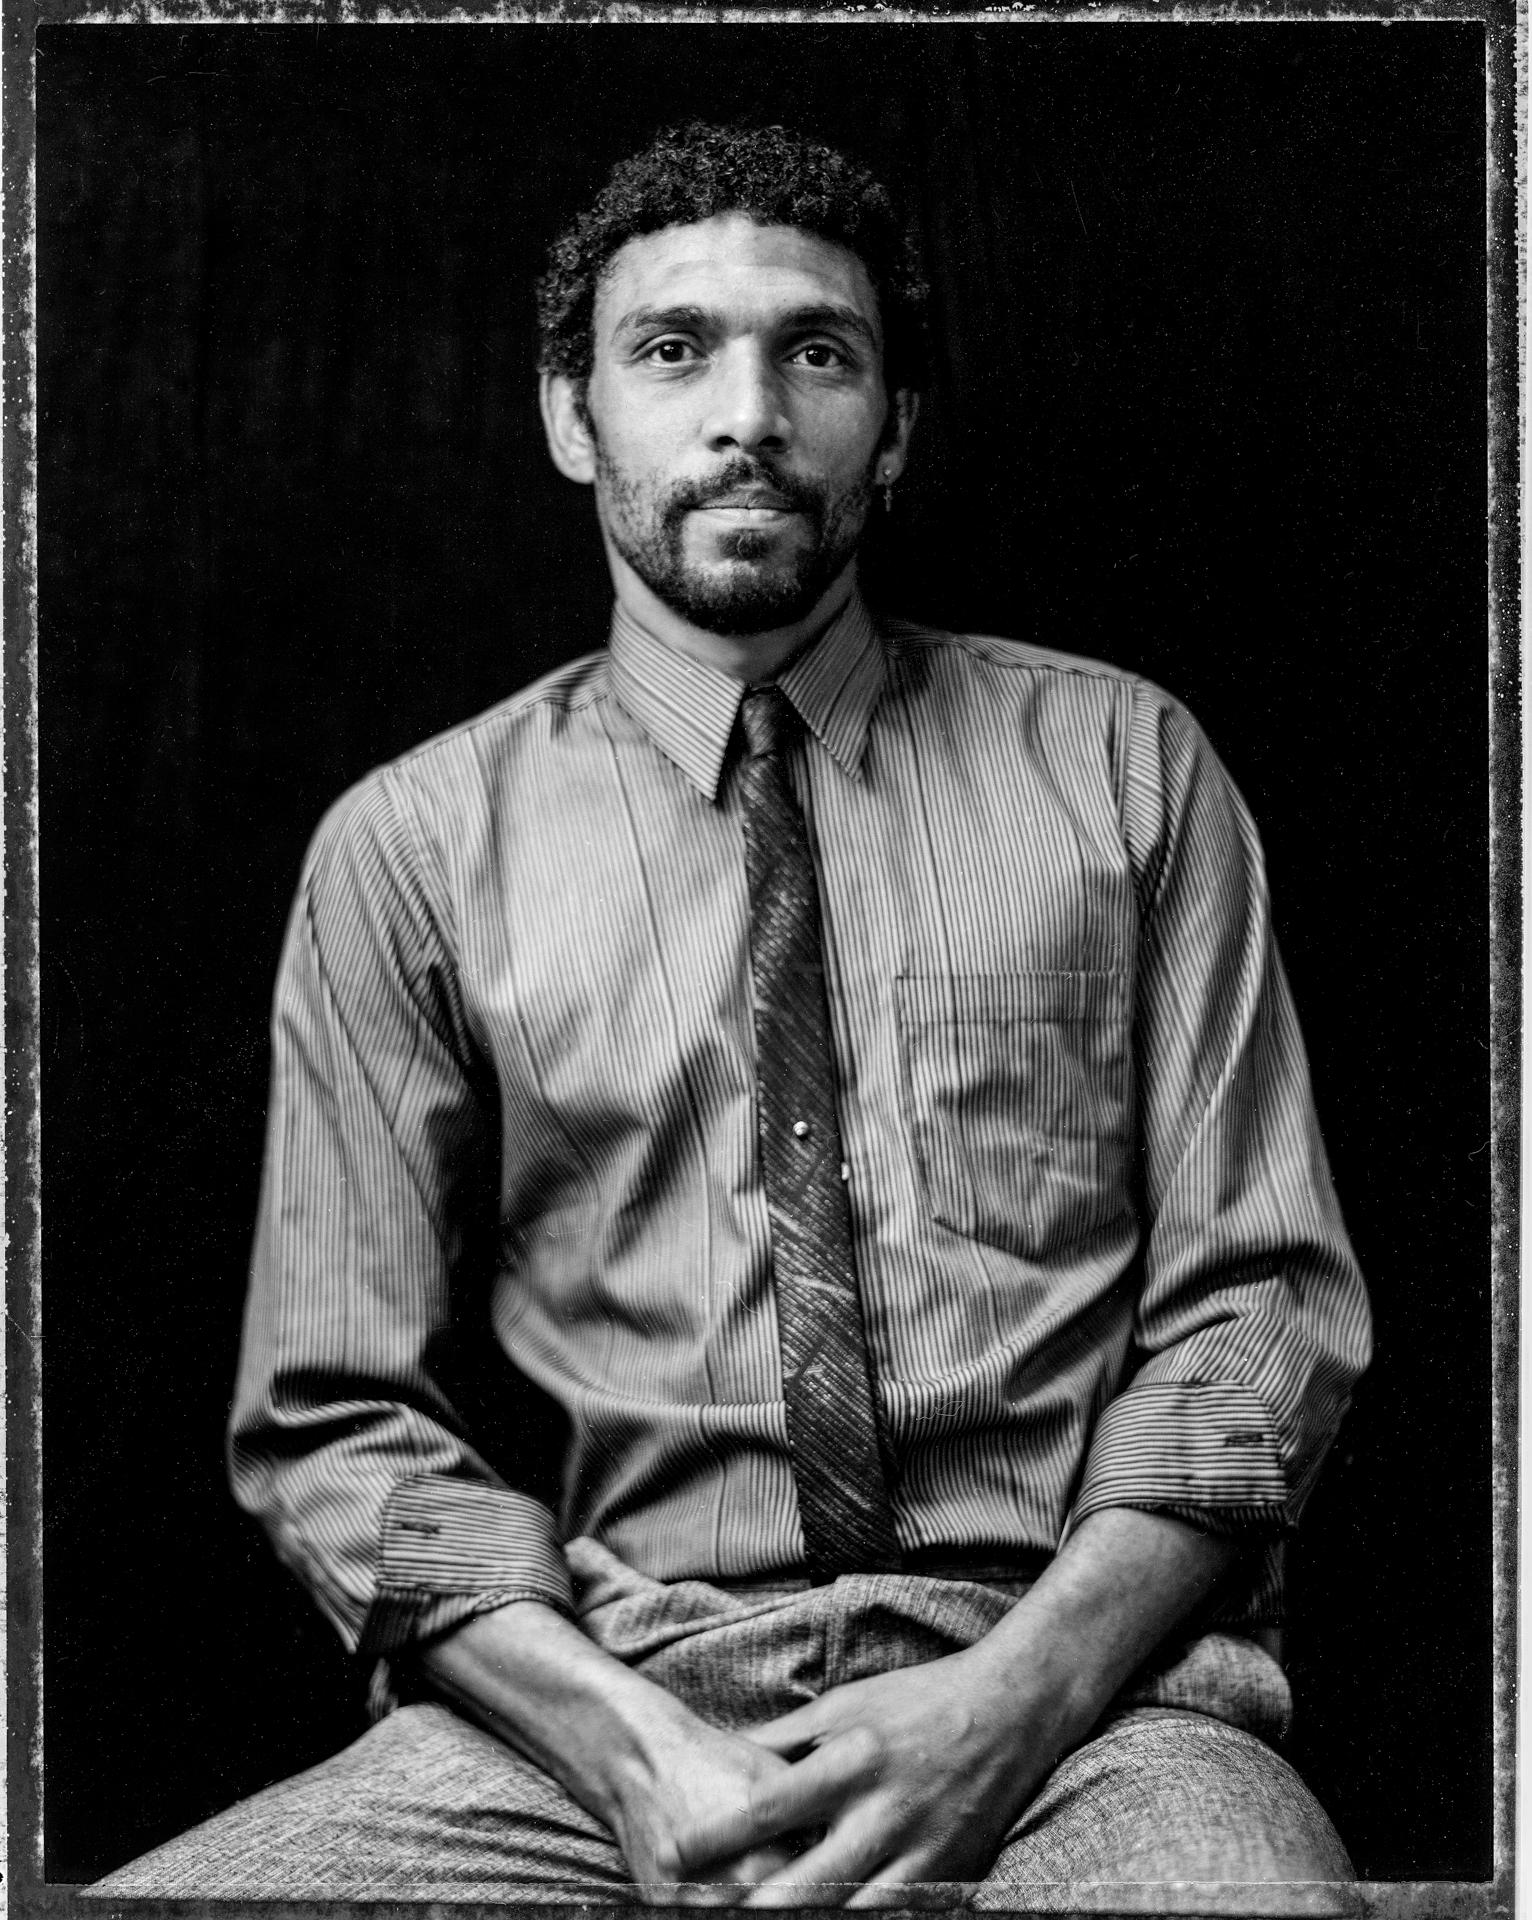 Man with a Tie, Shanti House, San Francisco